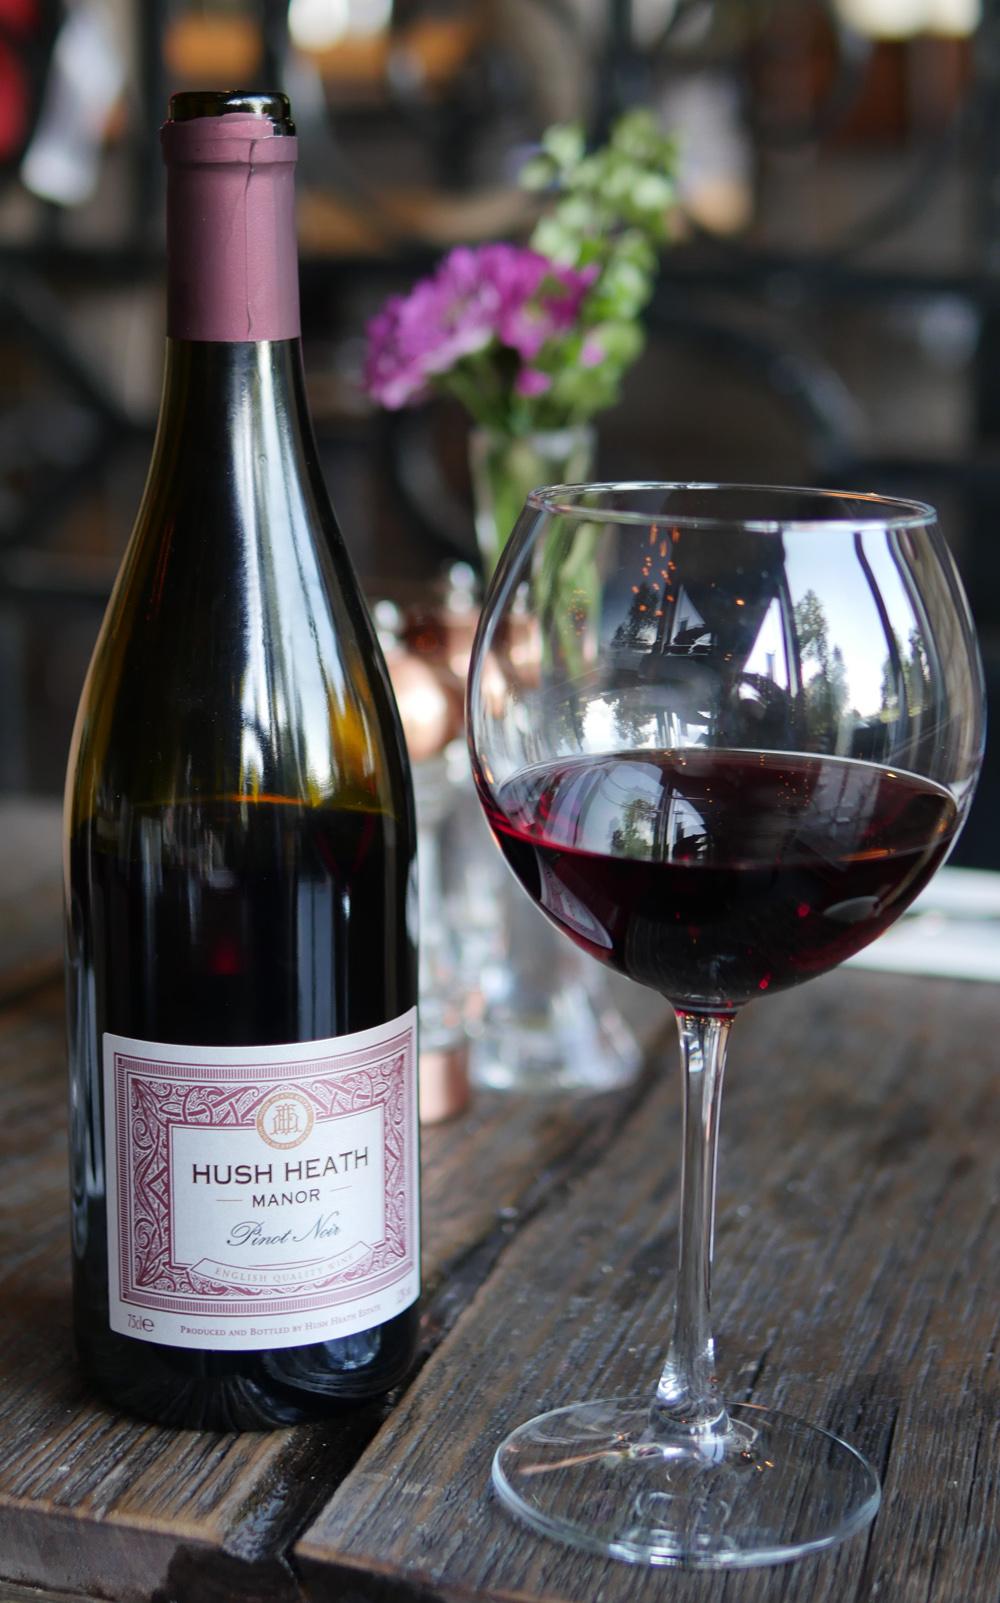 Hush Heath English Pinot Noir at Parks Edge Bar and Kitchen